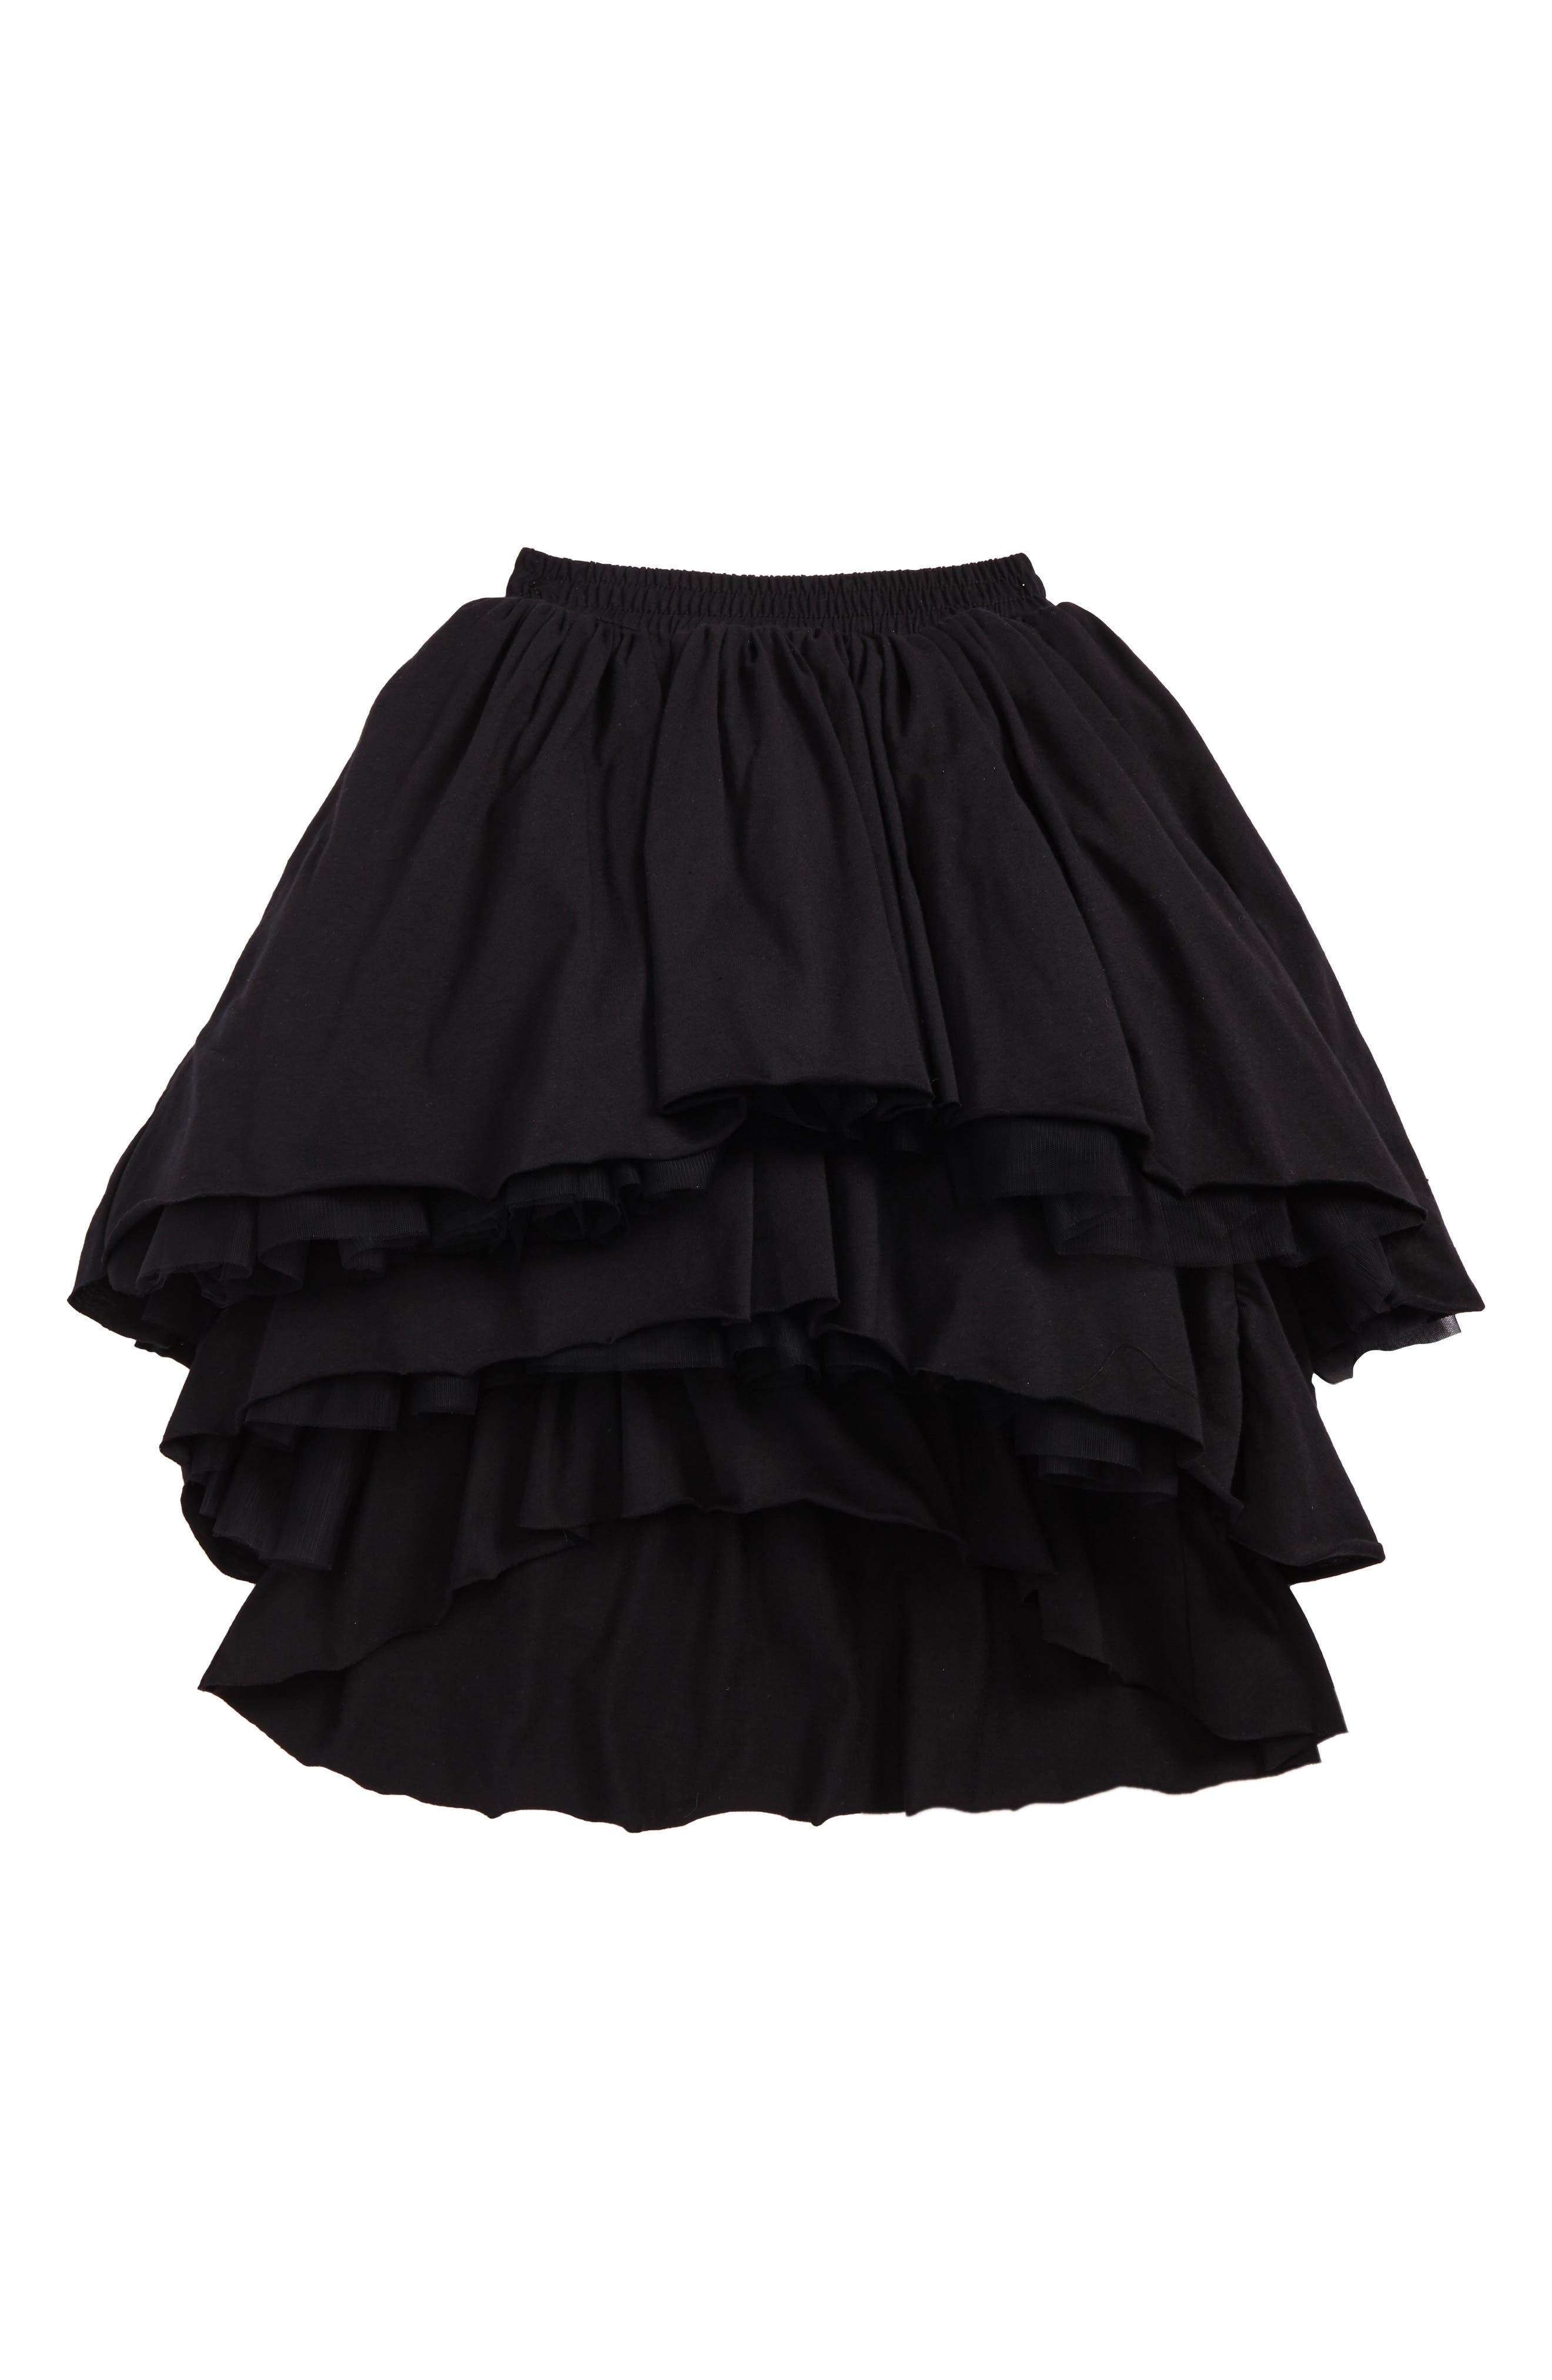 Alternate Image 1 Selected - Nununu Layered Tulle Skirt (Toddler Girls & Little Girls)